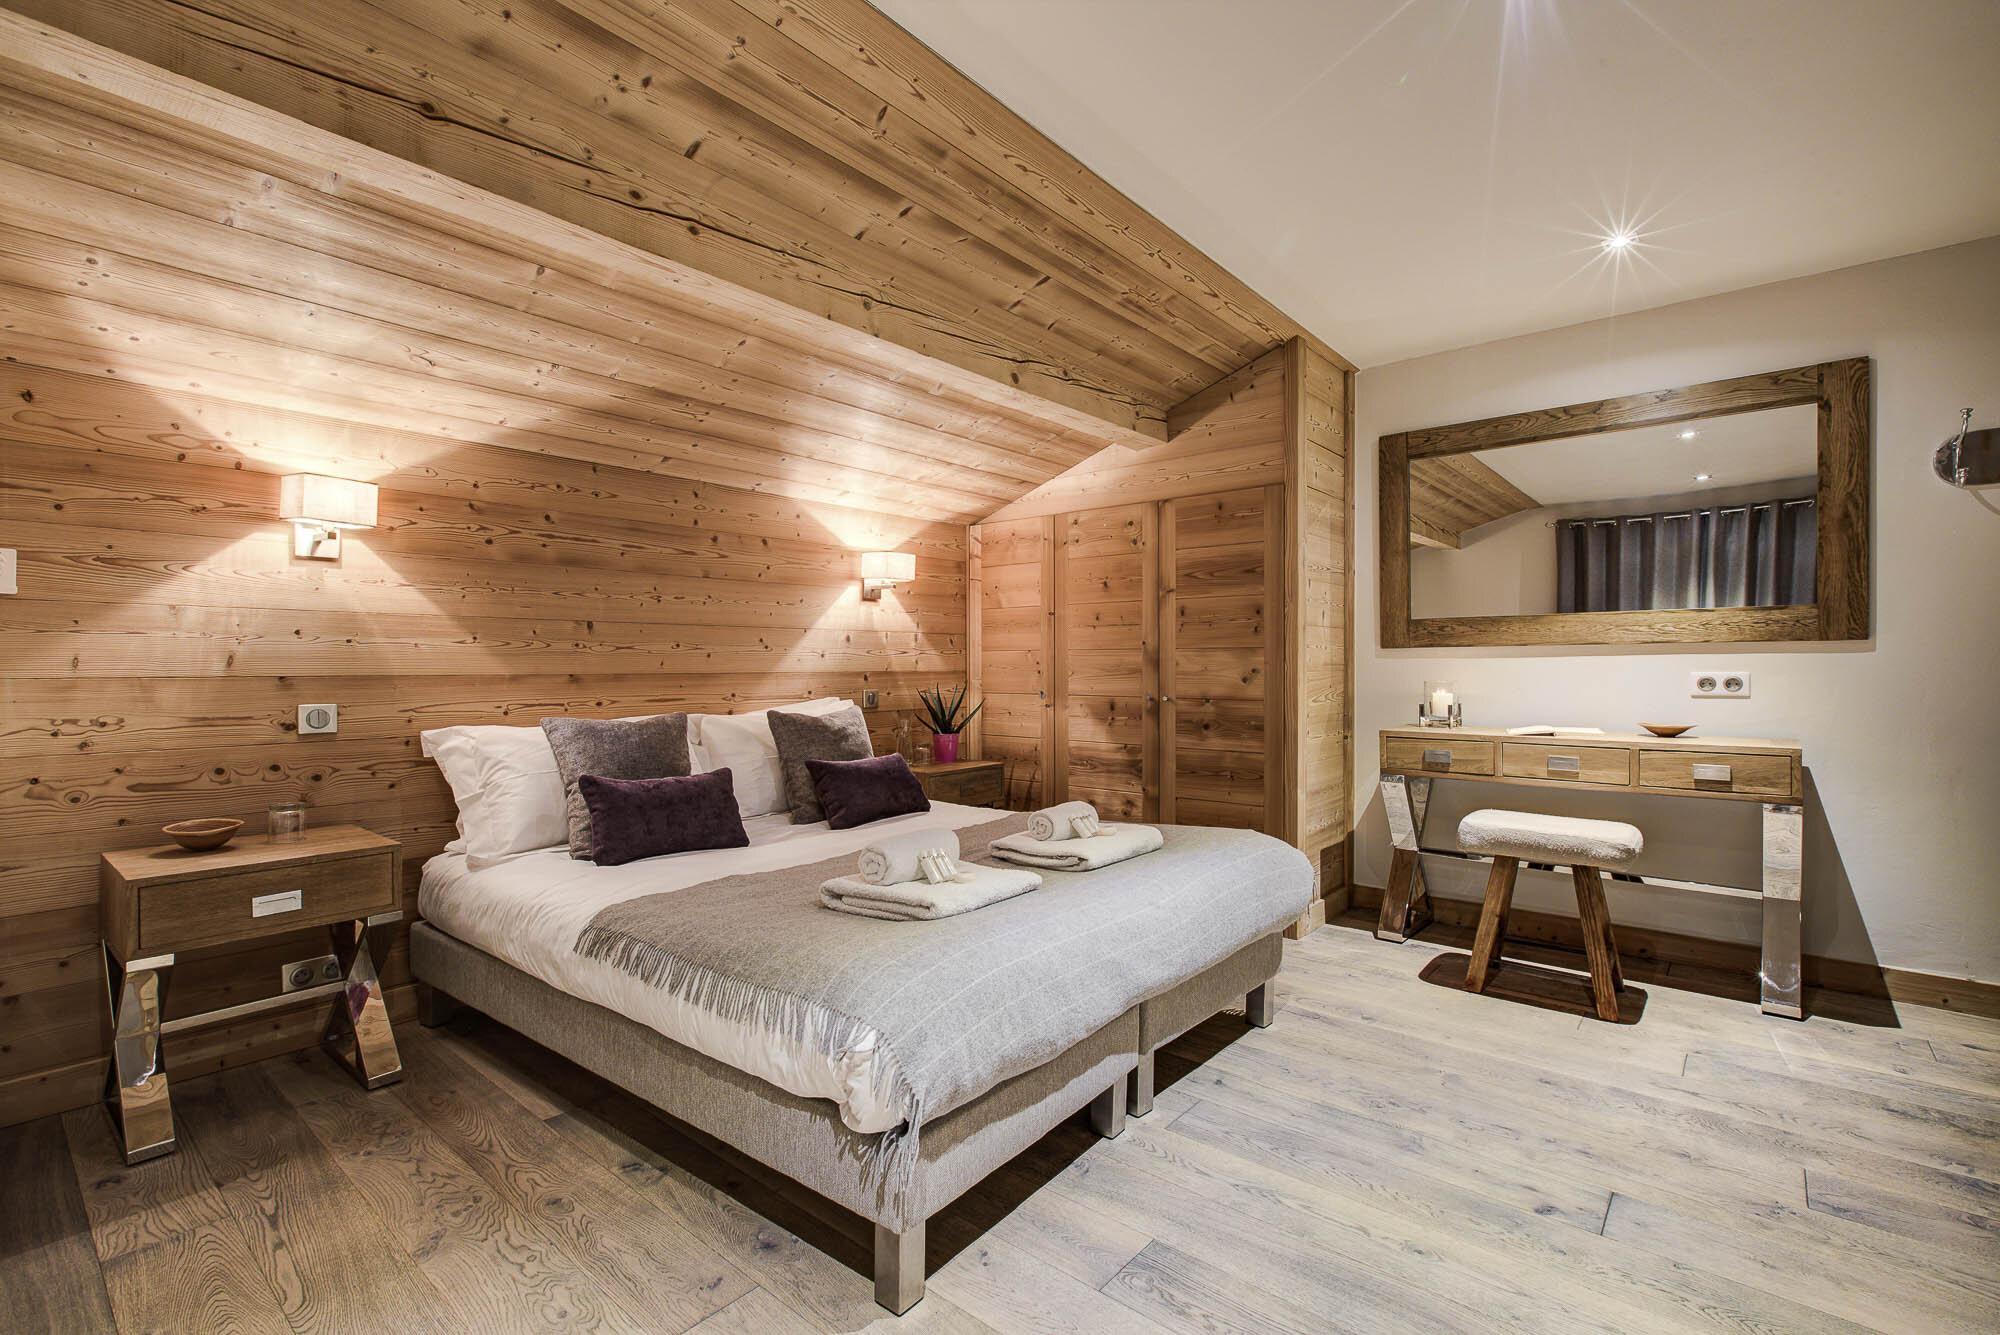 tg-ski-luxury-chalet-les-pierrys-morzine-003.jpg